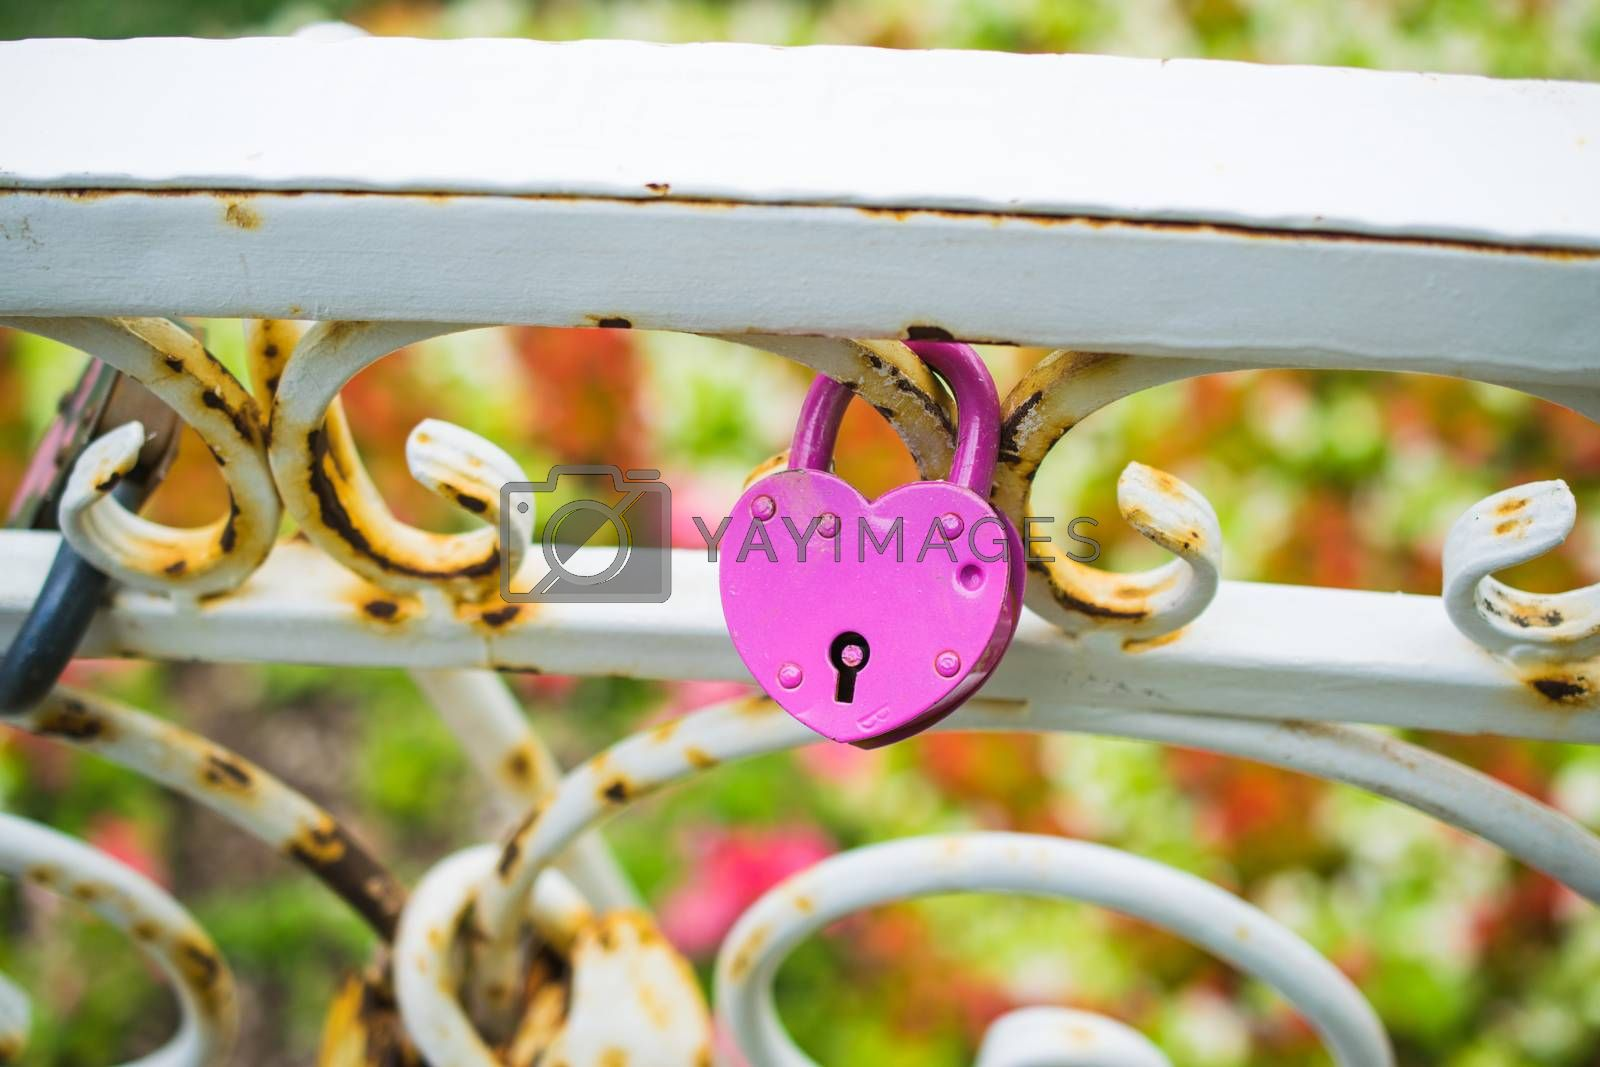 wedding tradition - locks on the bridge or fence by Sorokinsamara